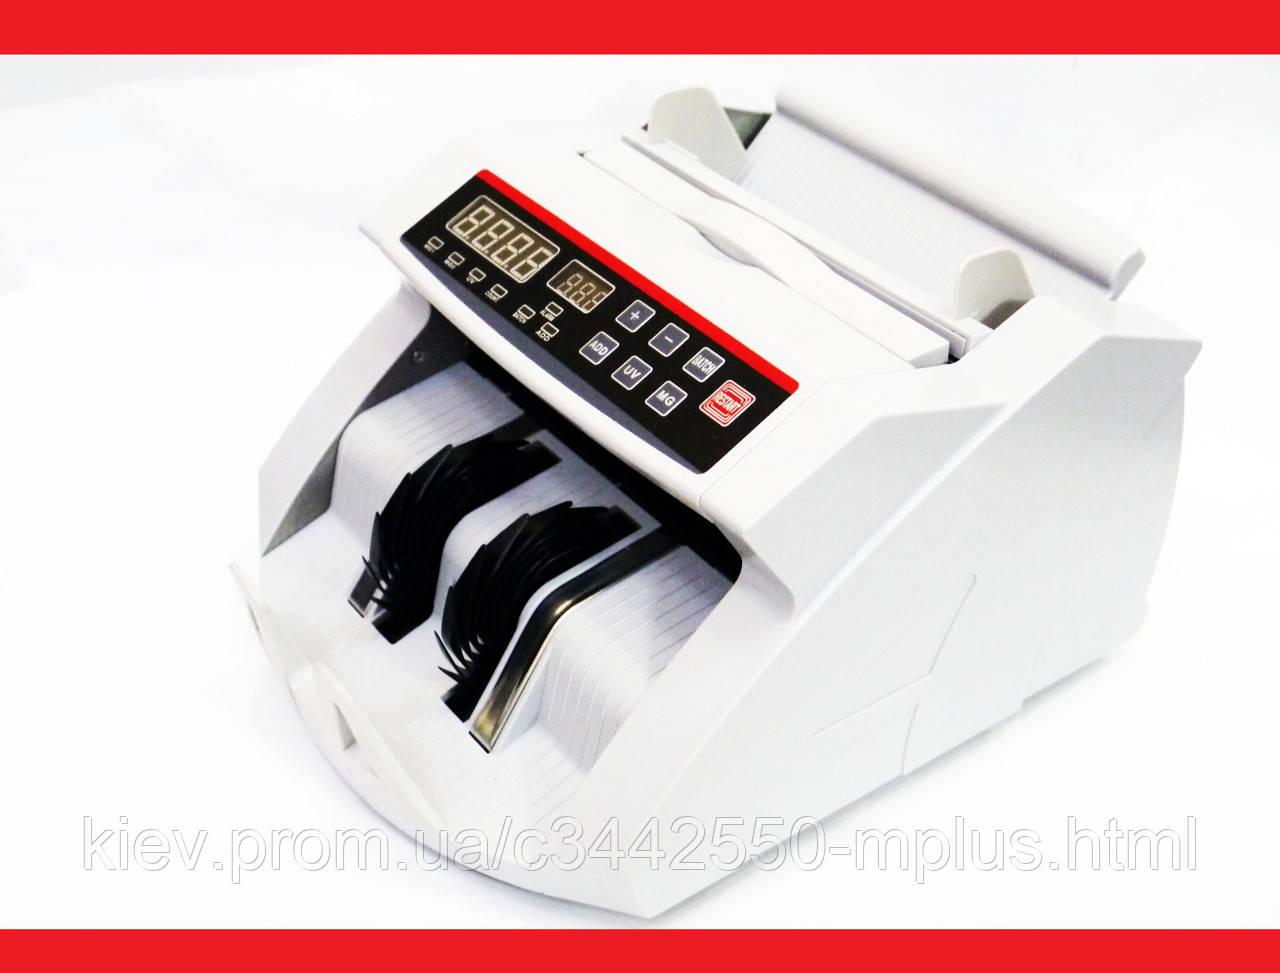 Bill Counter 2108 Счетная машинка для купюр